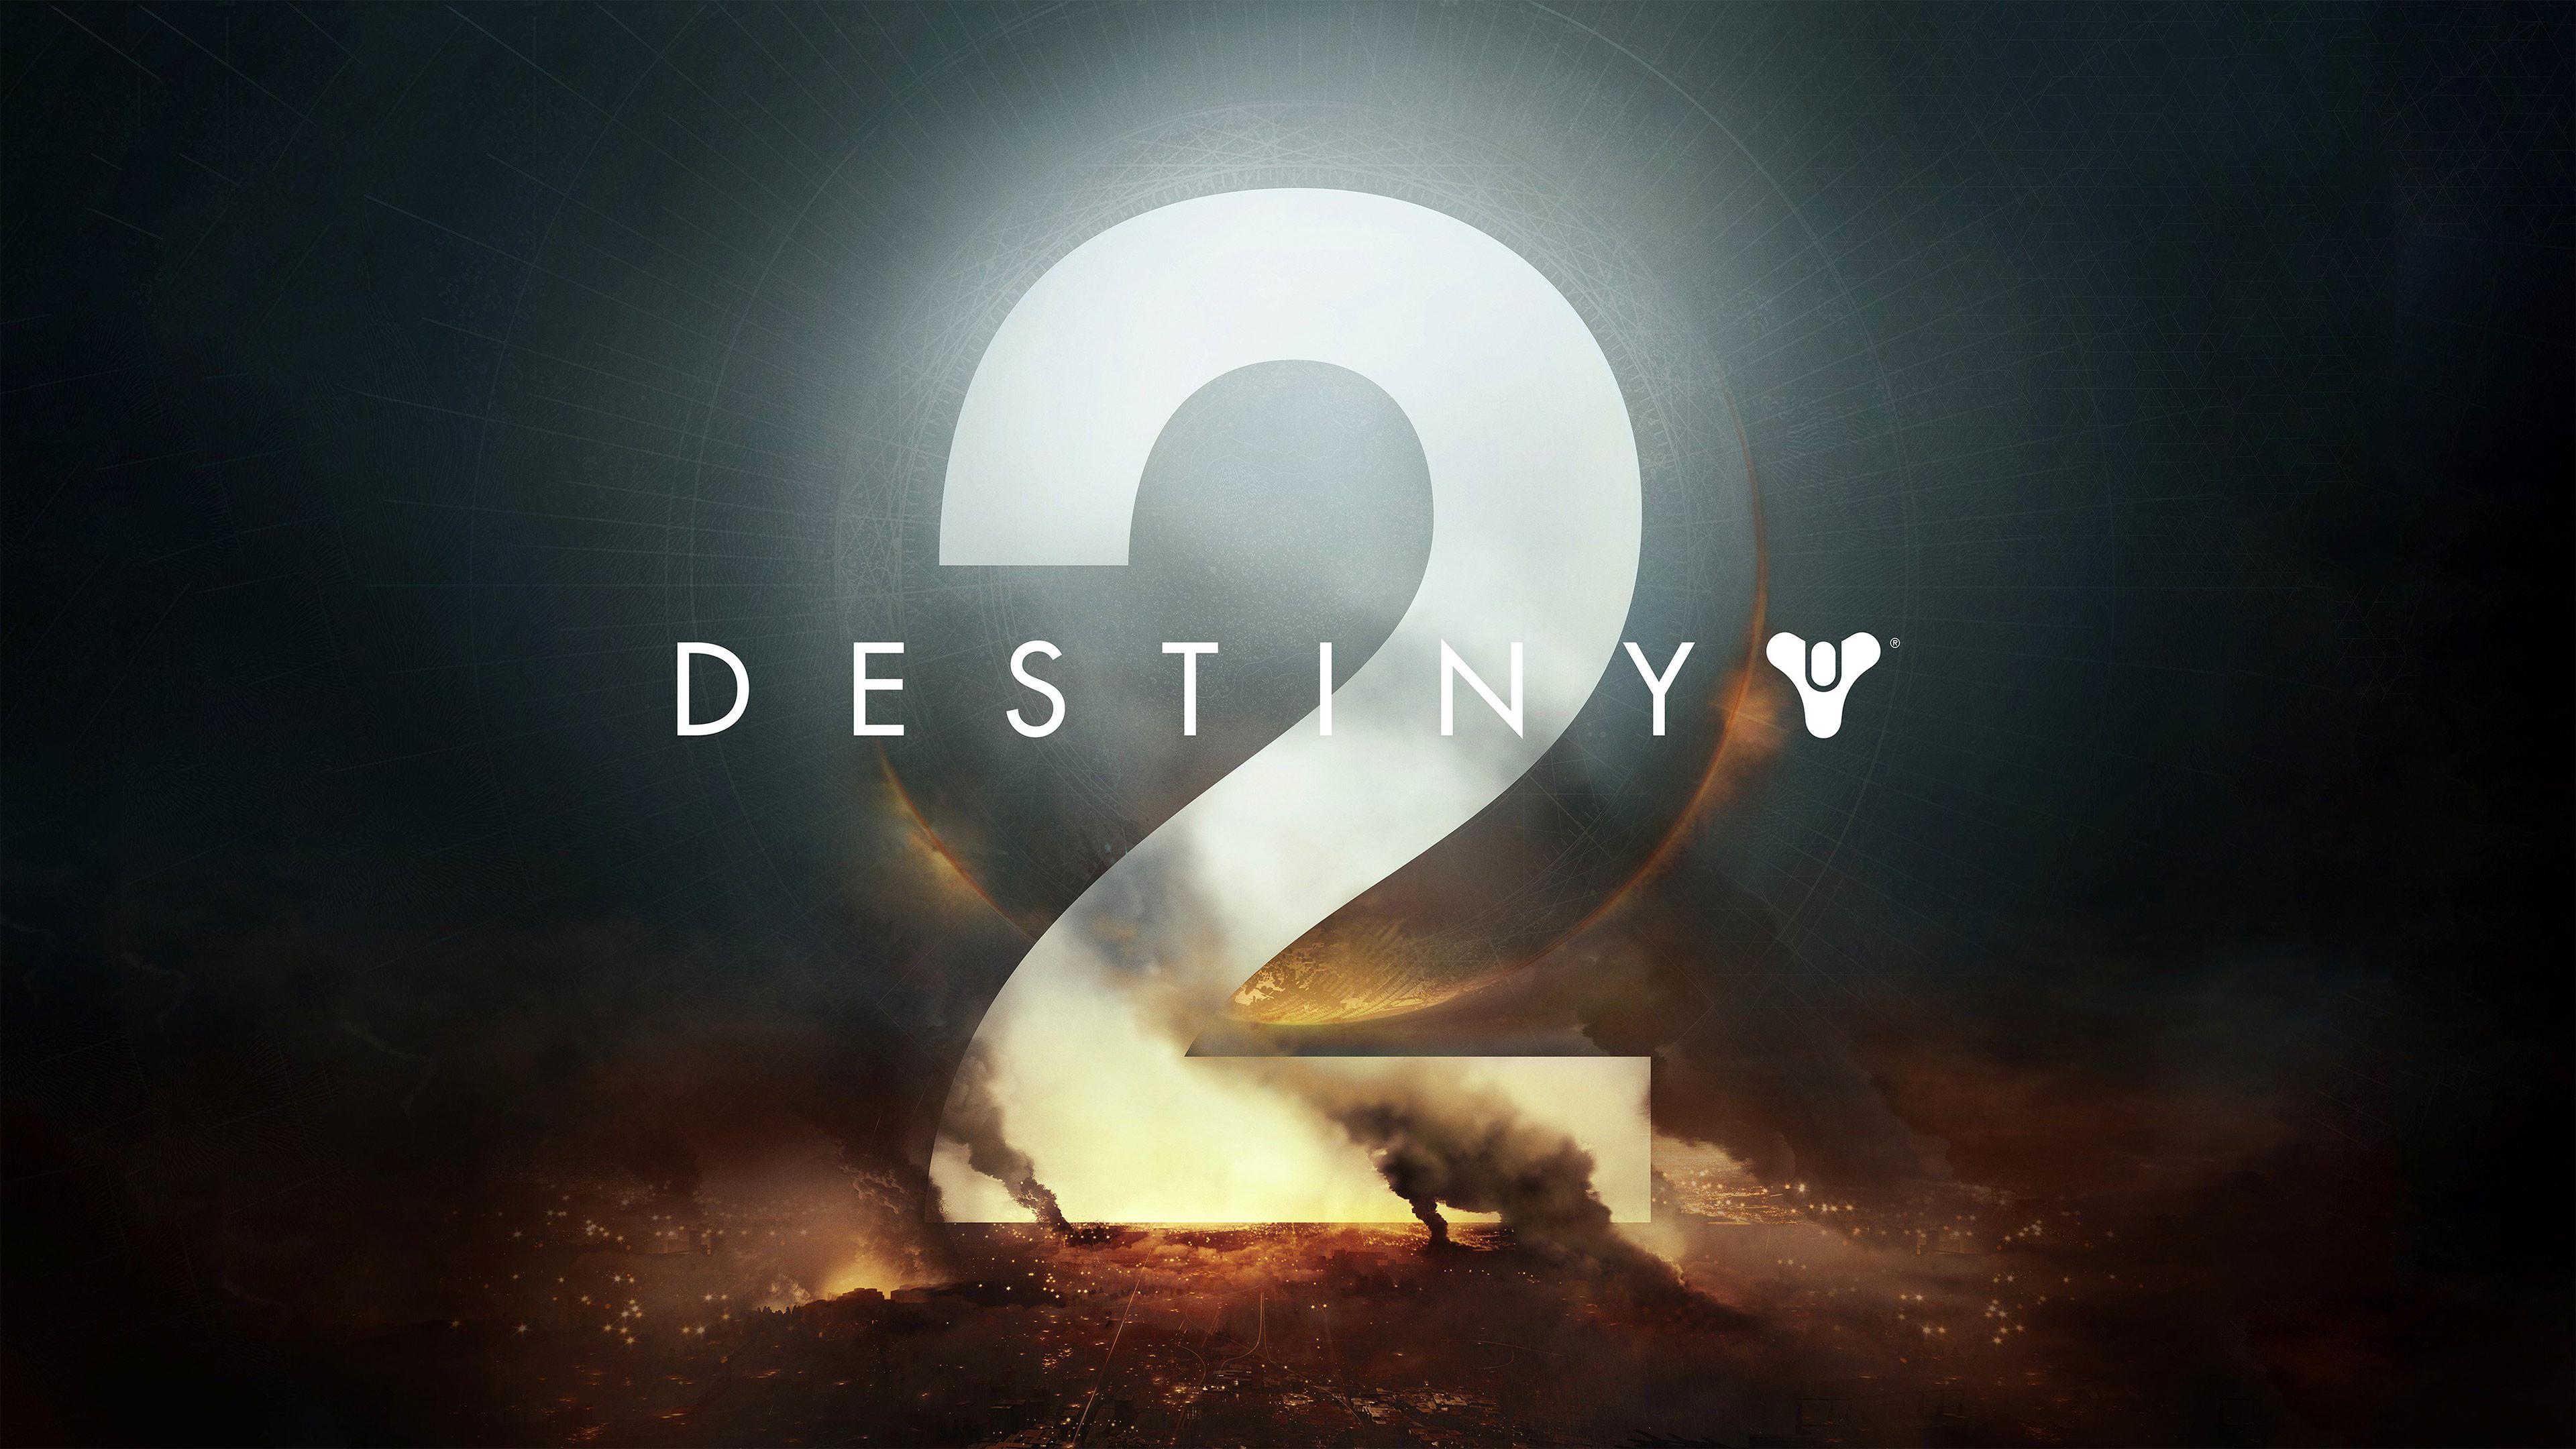 Destiny 2 4K Wallpaper …